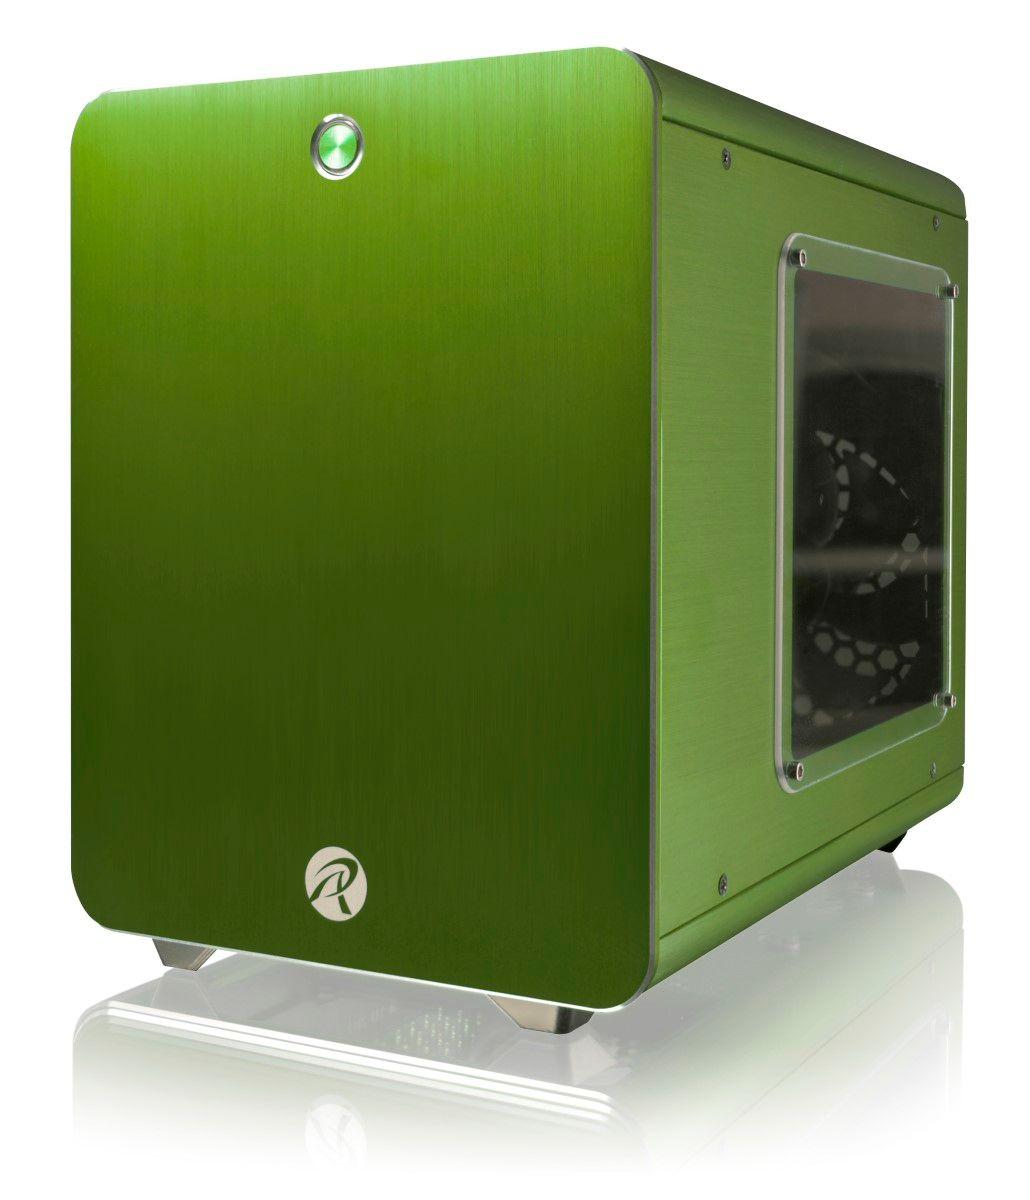 RAIJINTEK METIS- WINDOWED - GREEN MINI ITX CASE 0R200018